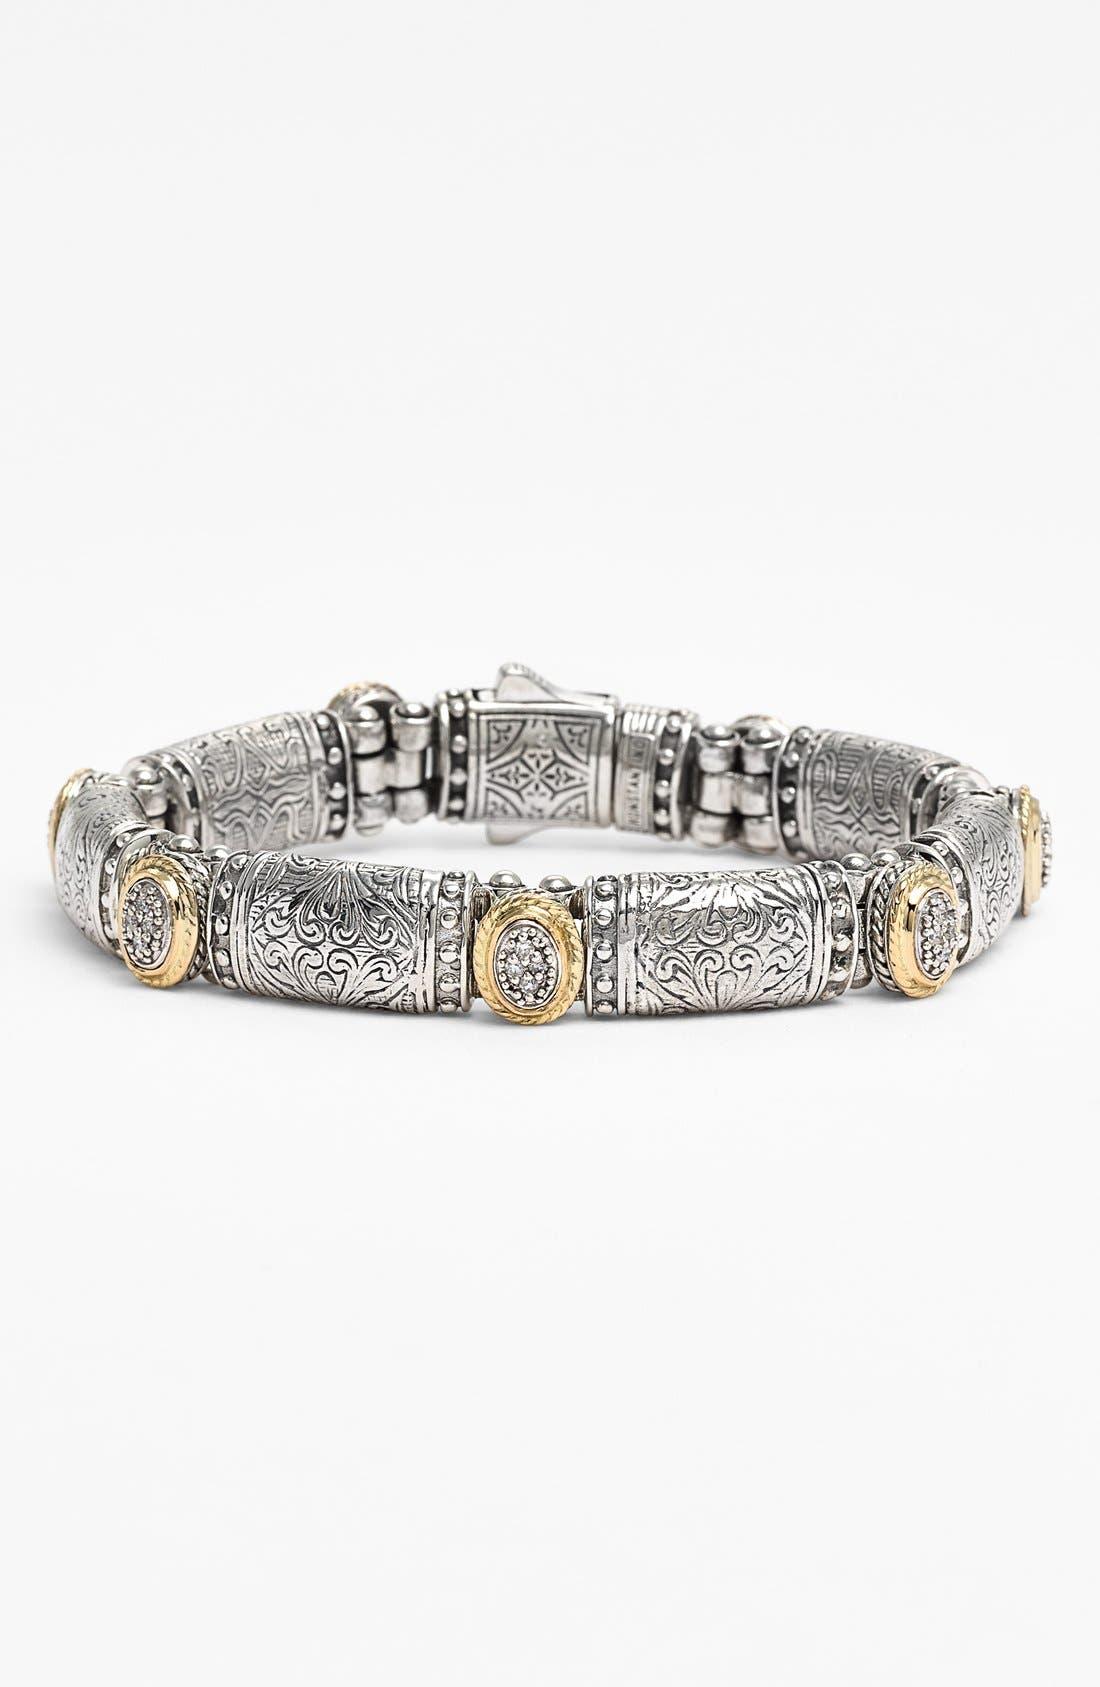 Main Image - Konstantino 'Classics' Diamond Bracelet